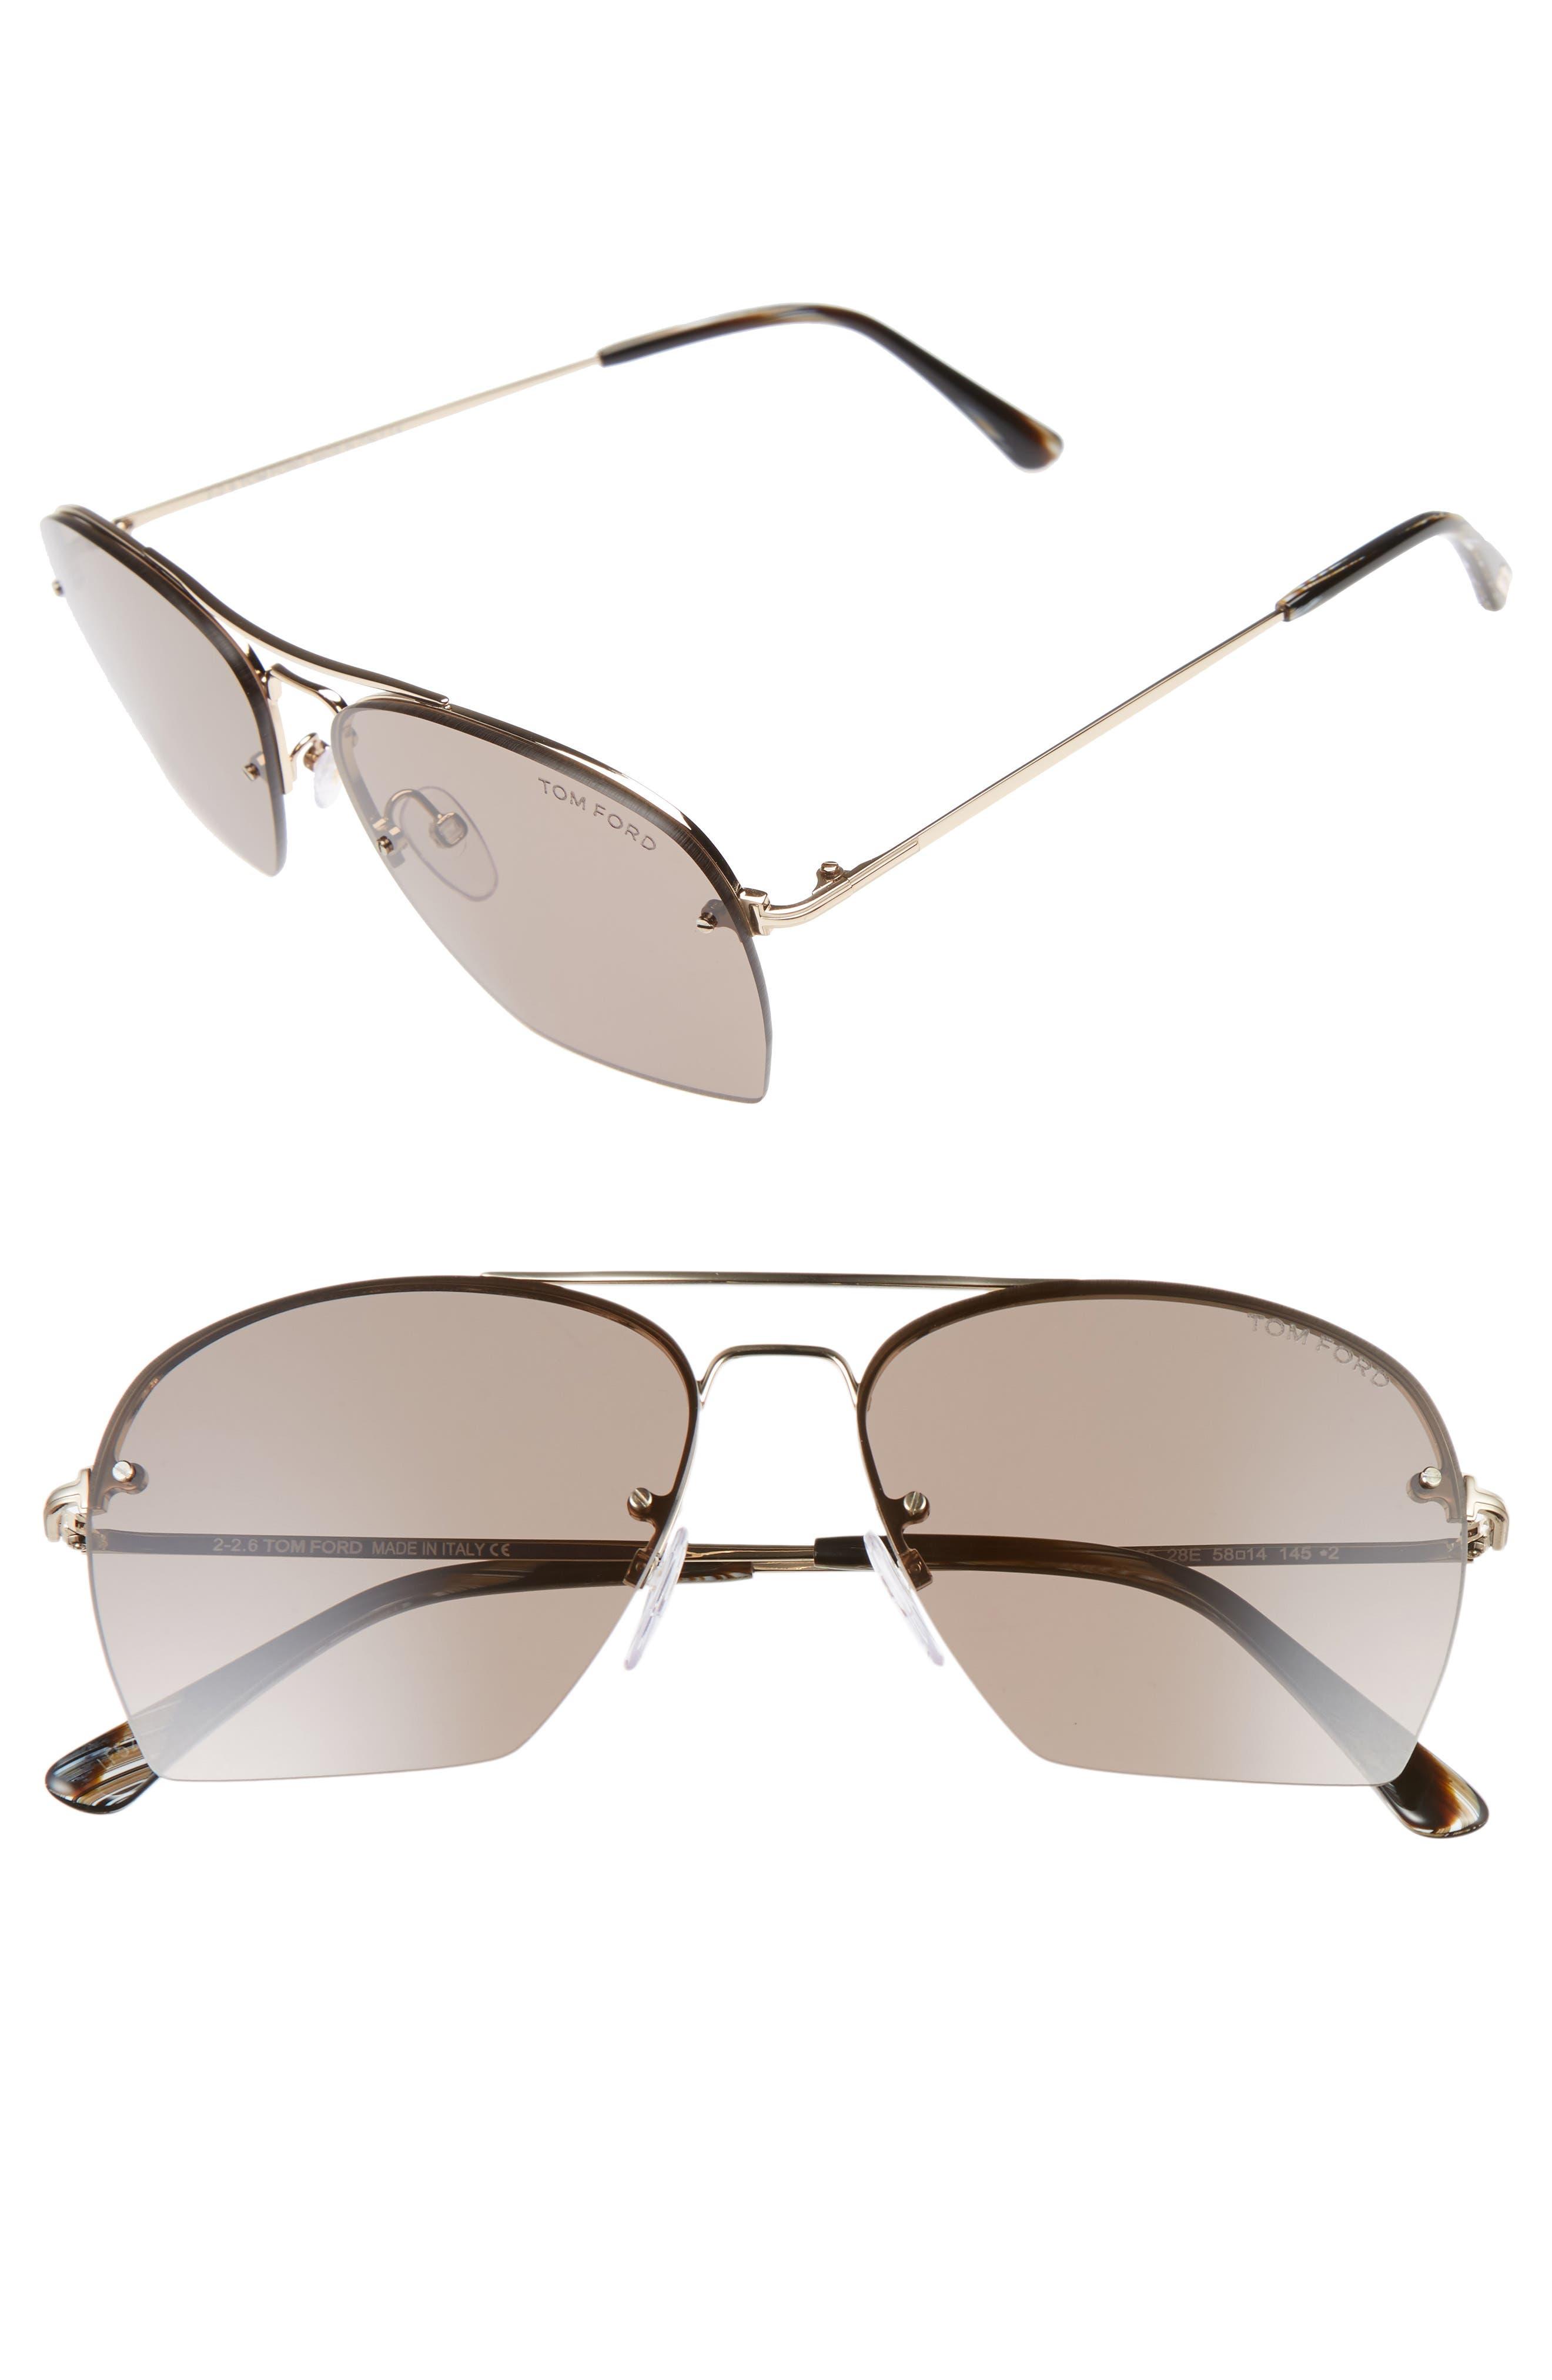 Whelan 58mm Aviator Sunglasses,                         Main,                         color, 710